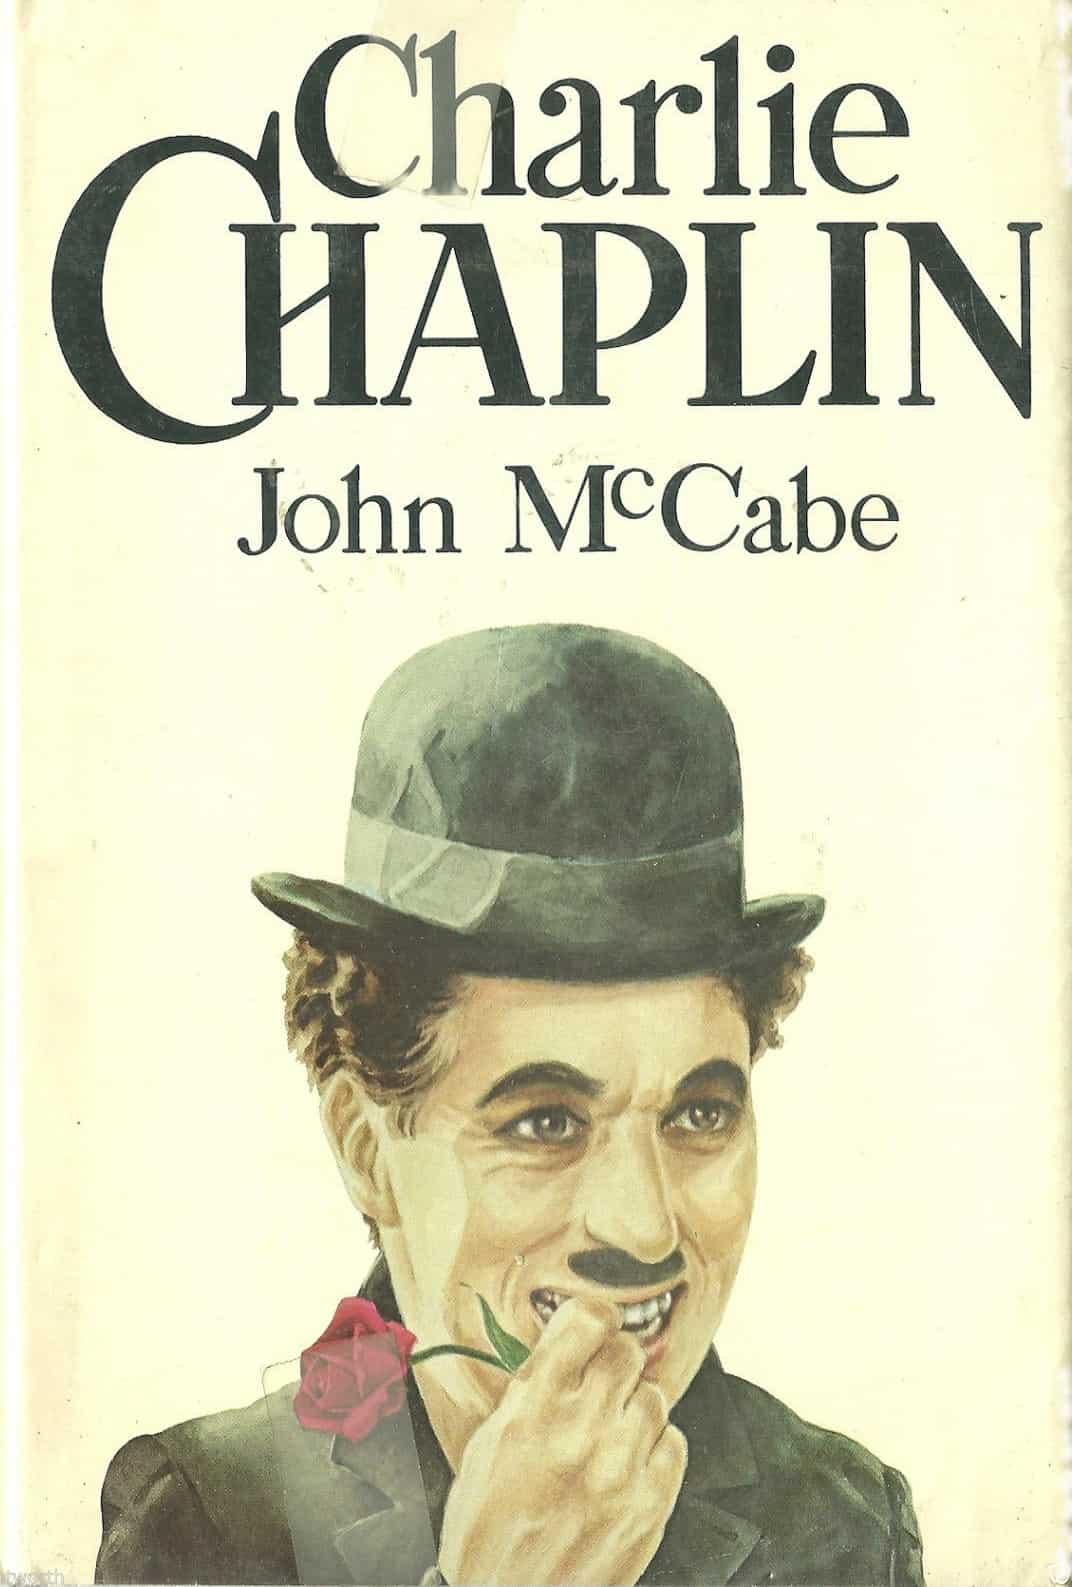 Charlie Chaplin - Charlie Chaplin